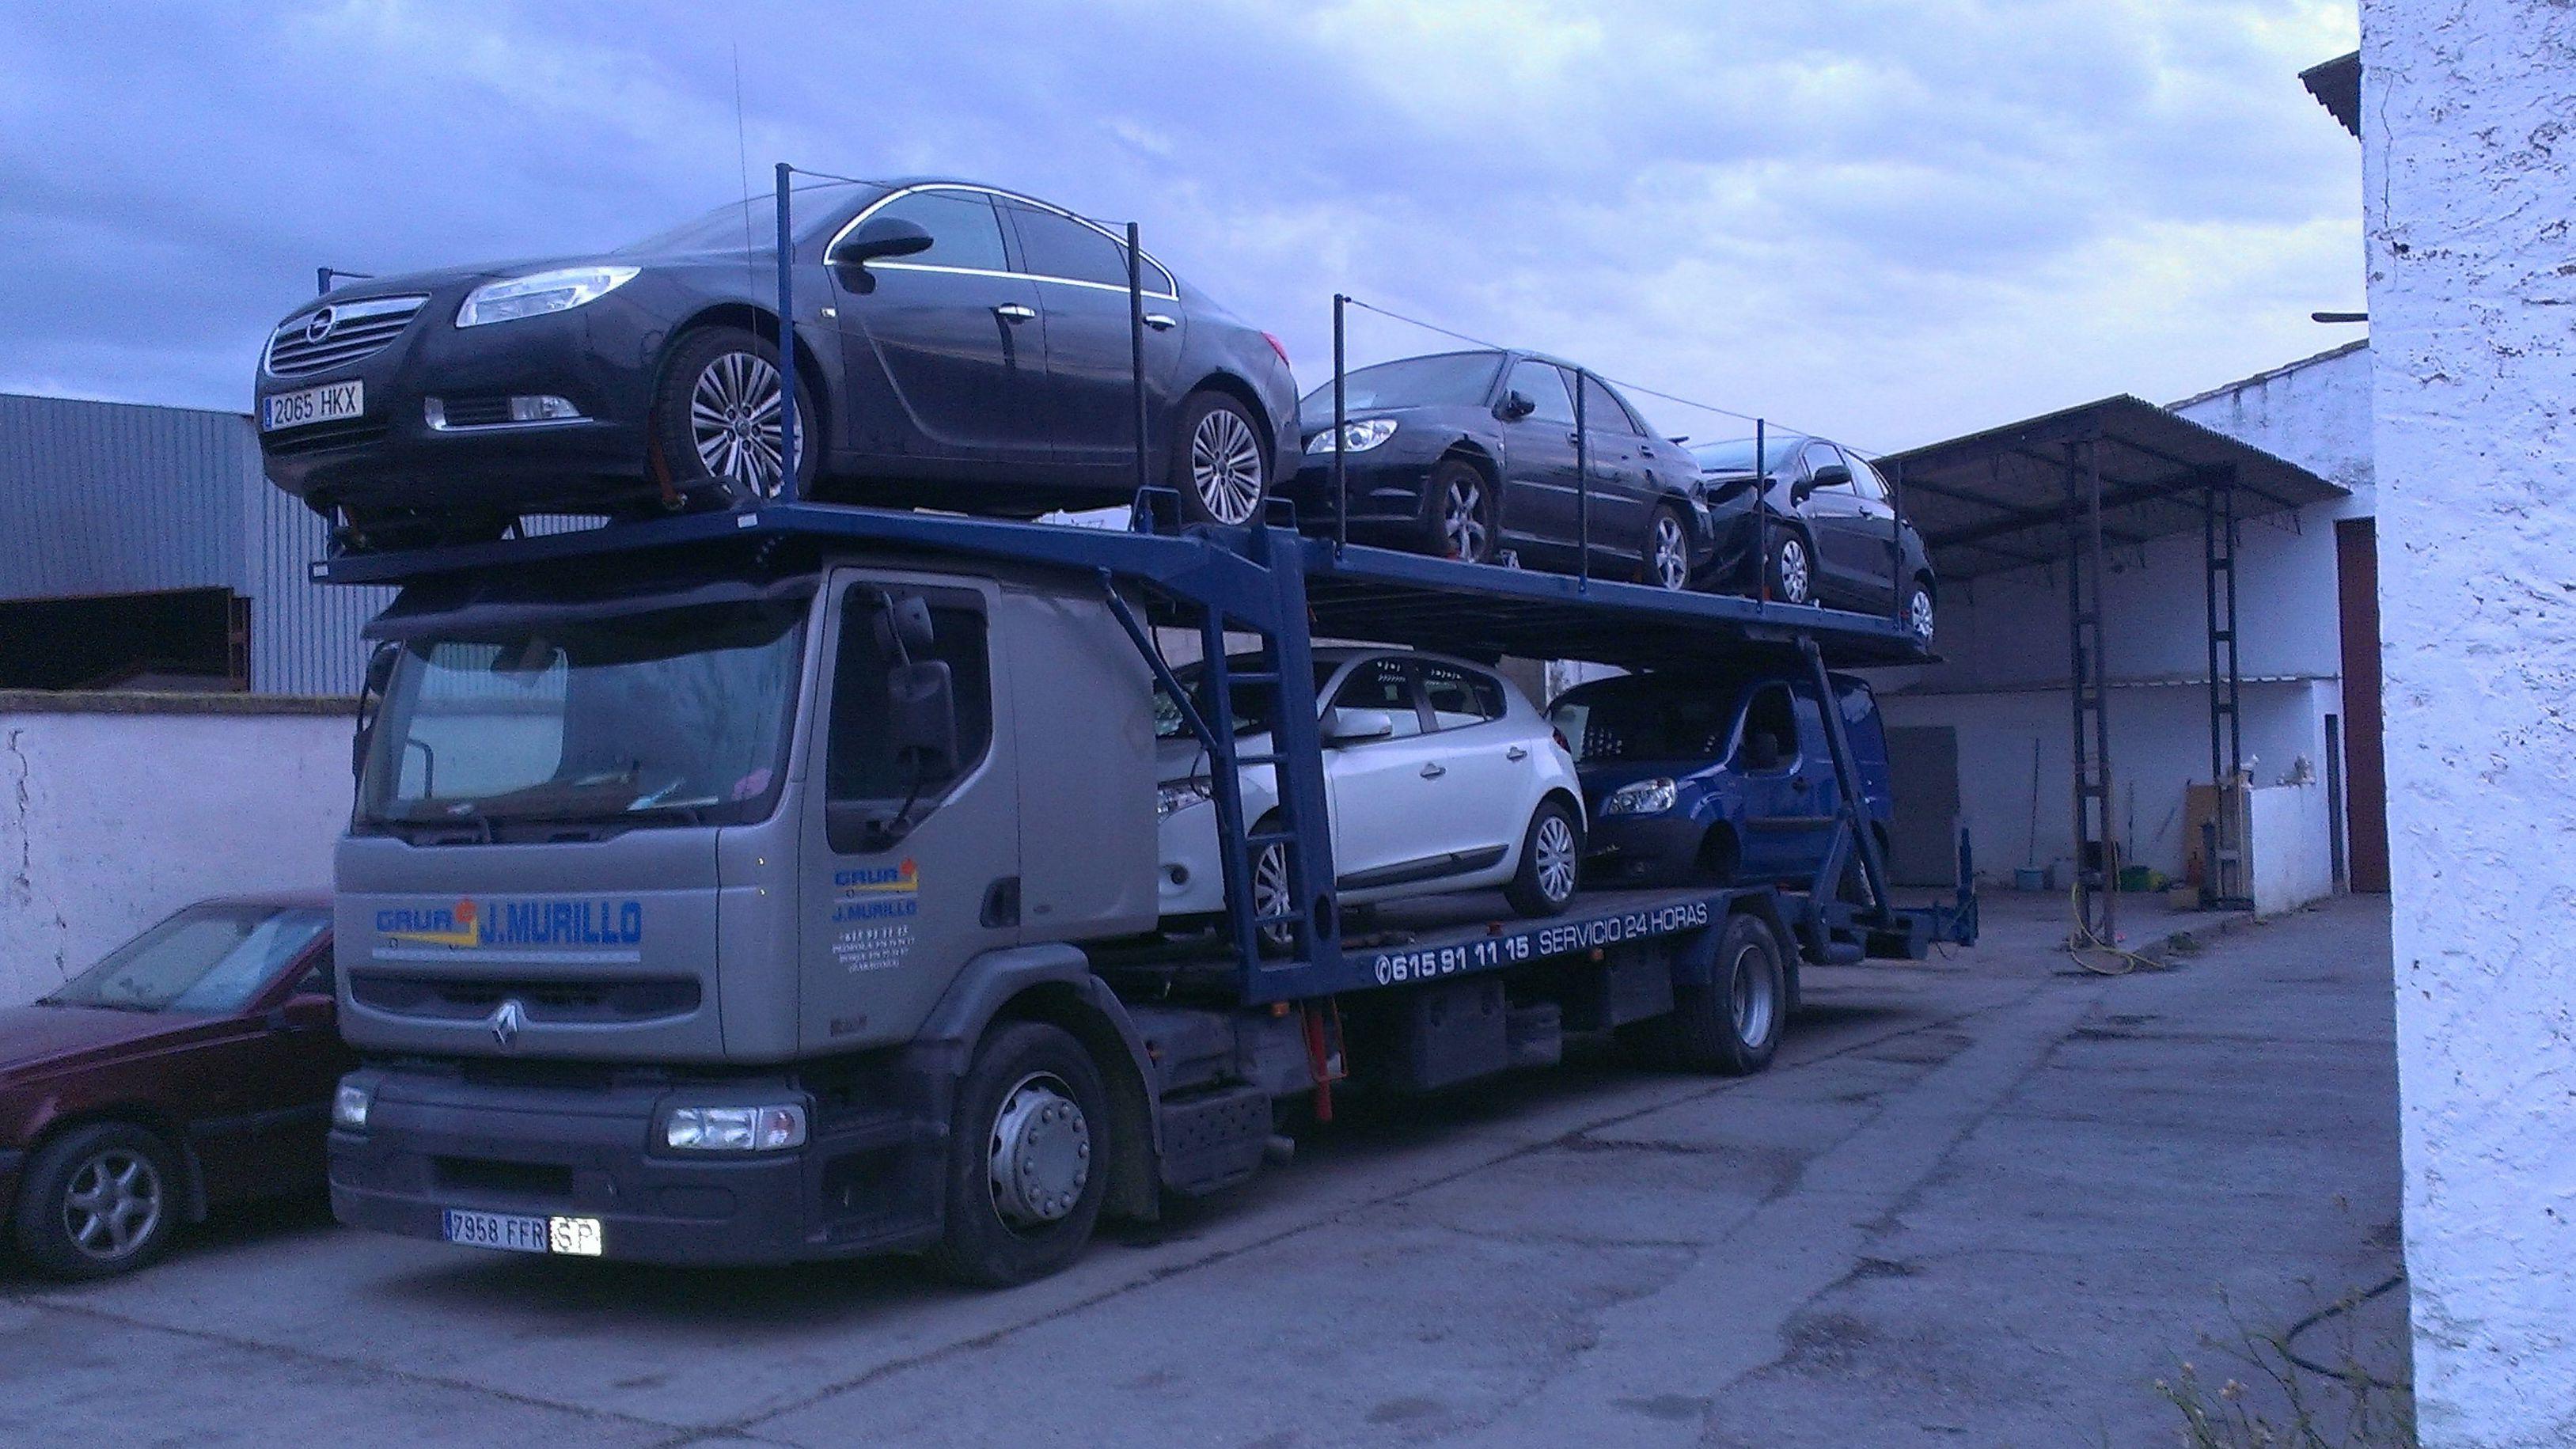 Foto 6 de Grúas para vehículos en Pedrola | Grúas J. Murillo